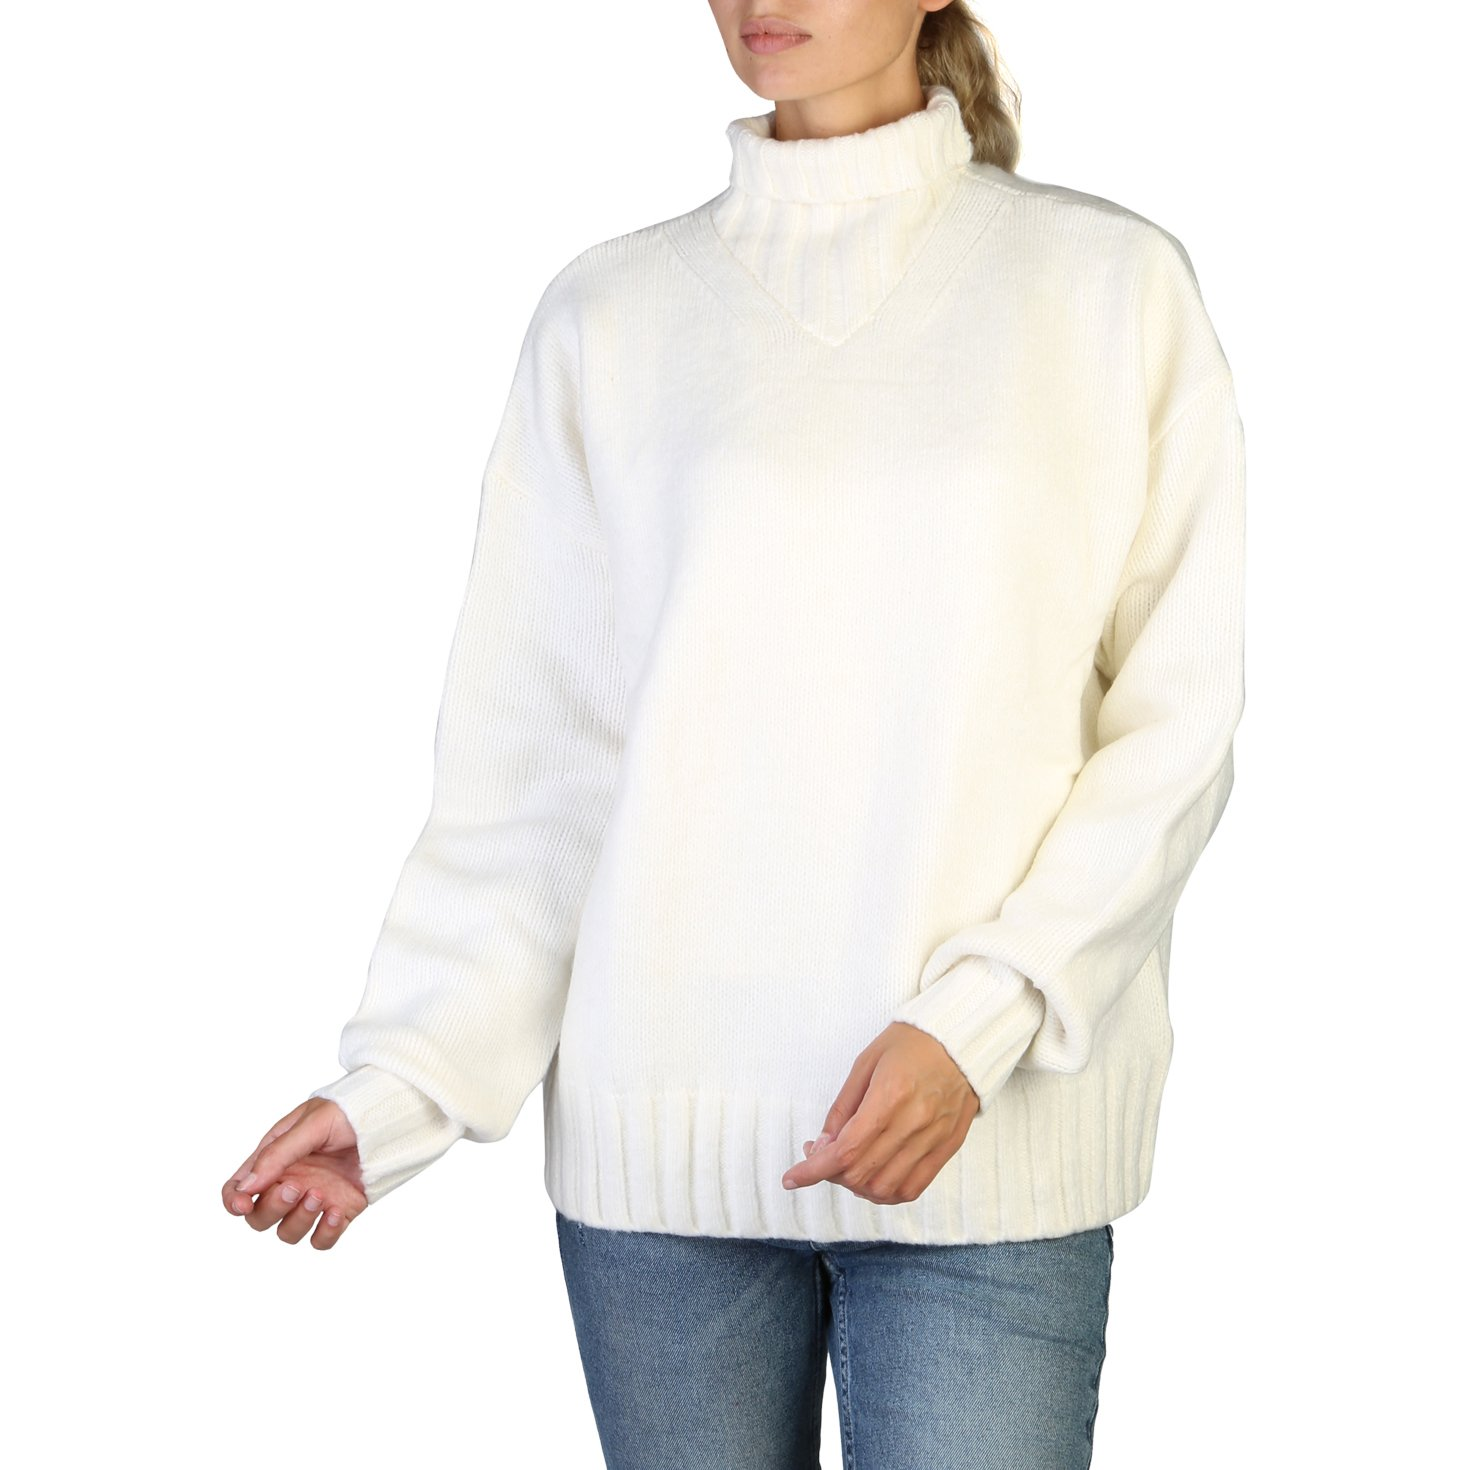 Calvin Klein Women's Sweaters Black 349515 - white S